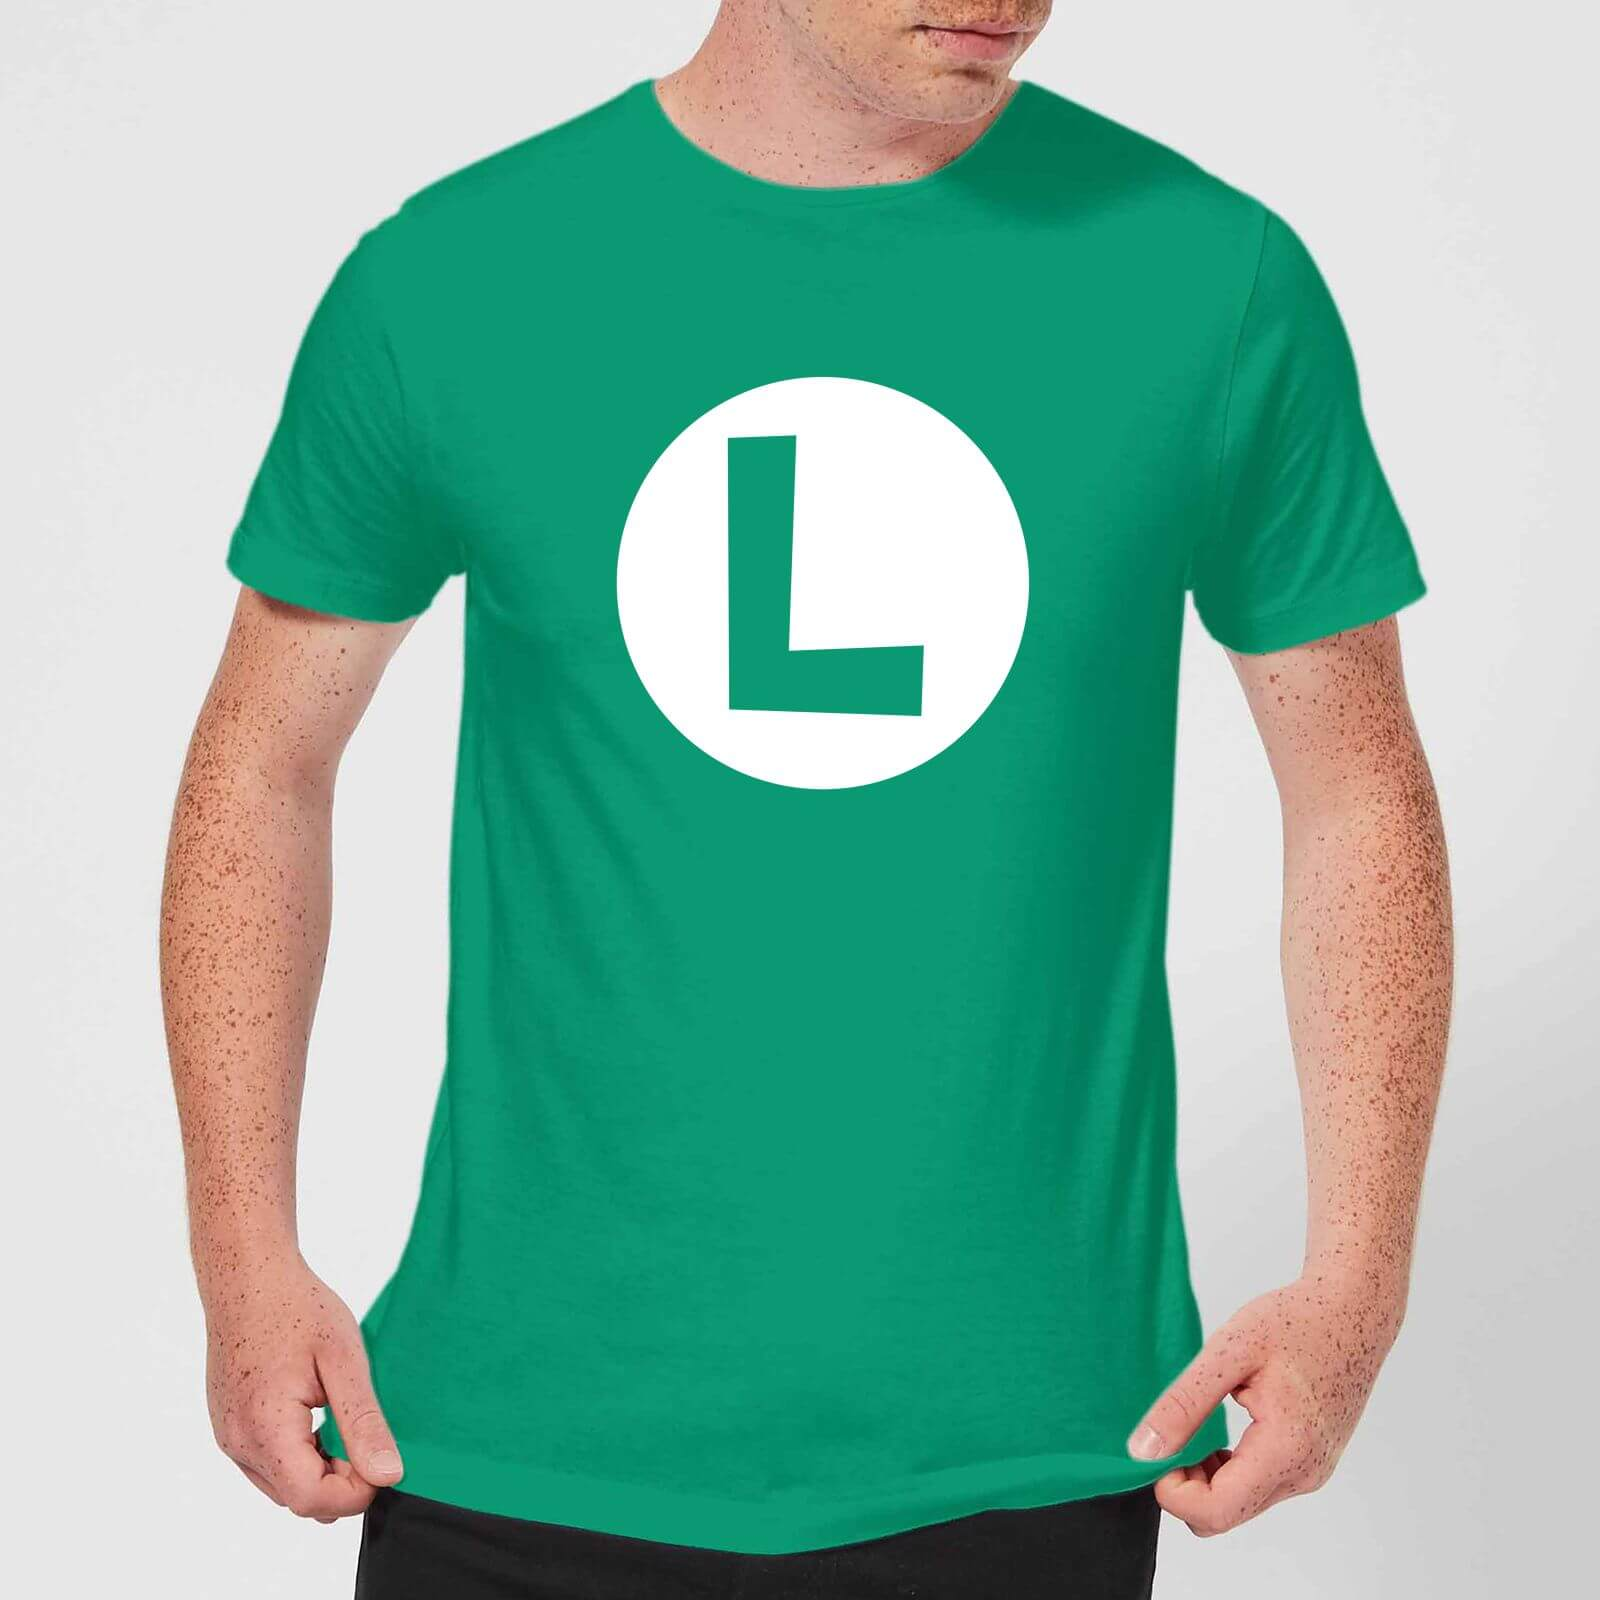 59b40b043 Nintendo Super Mario Luigi Logo Men's T-Shirt - Kelly Green Clothing   Zavvi